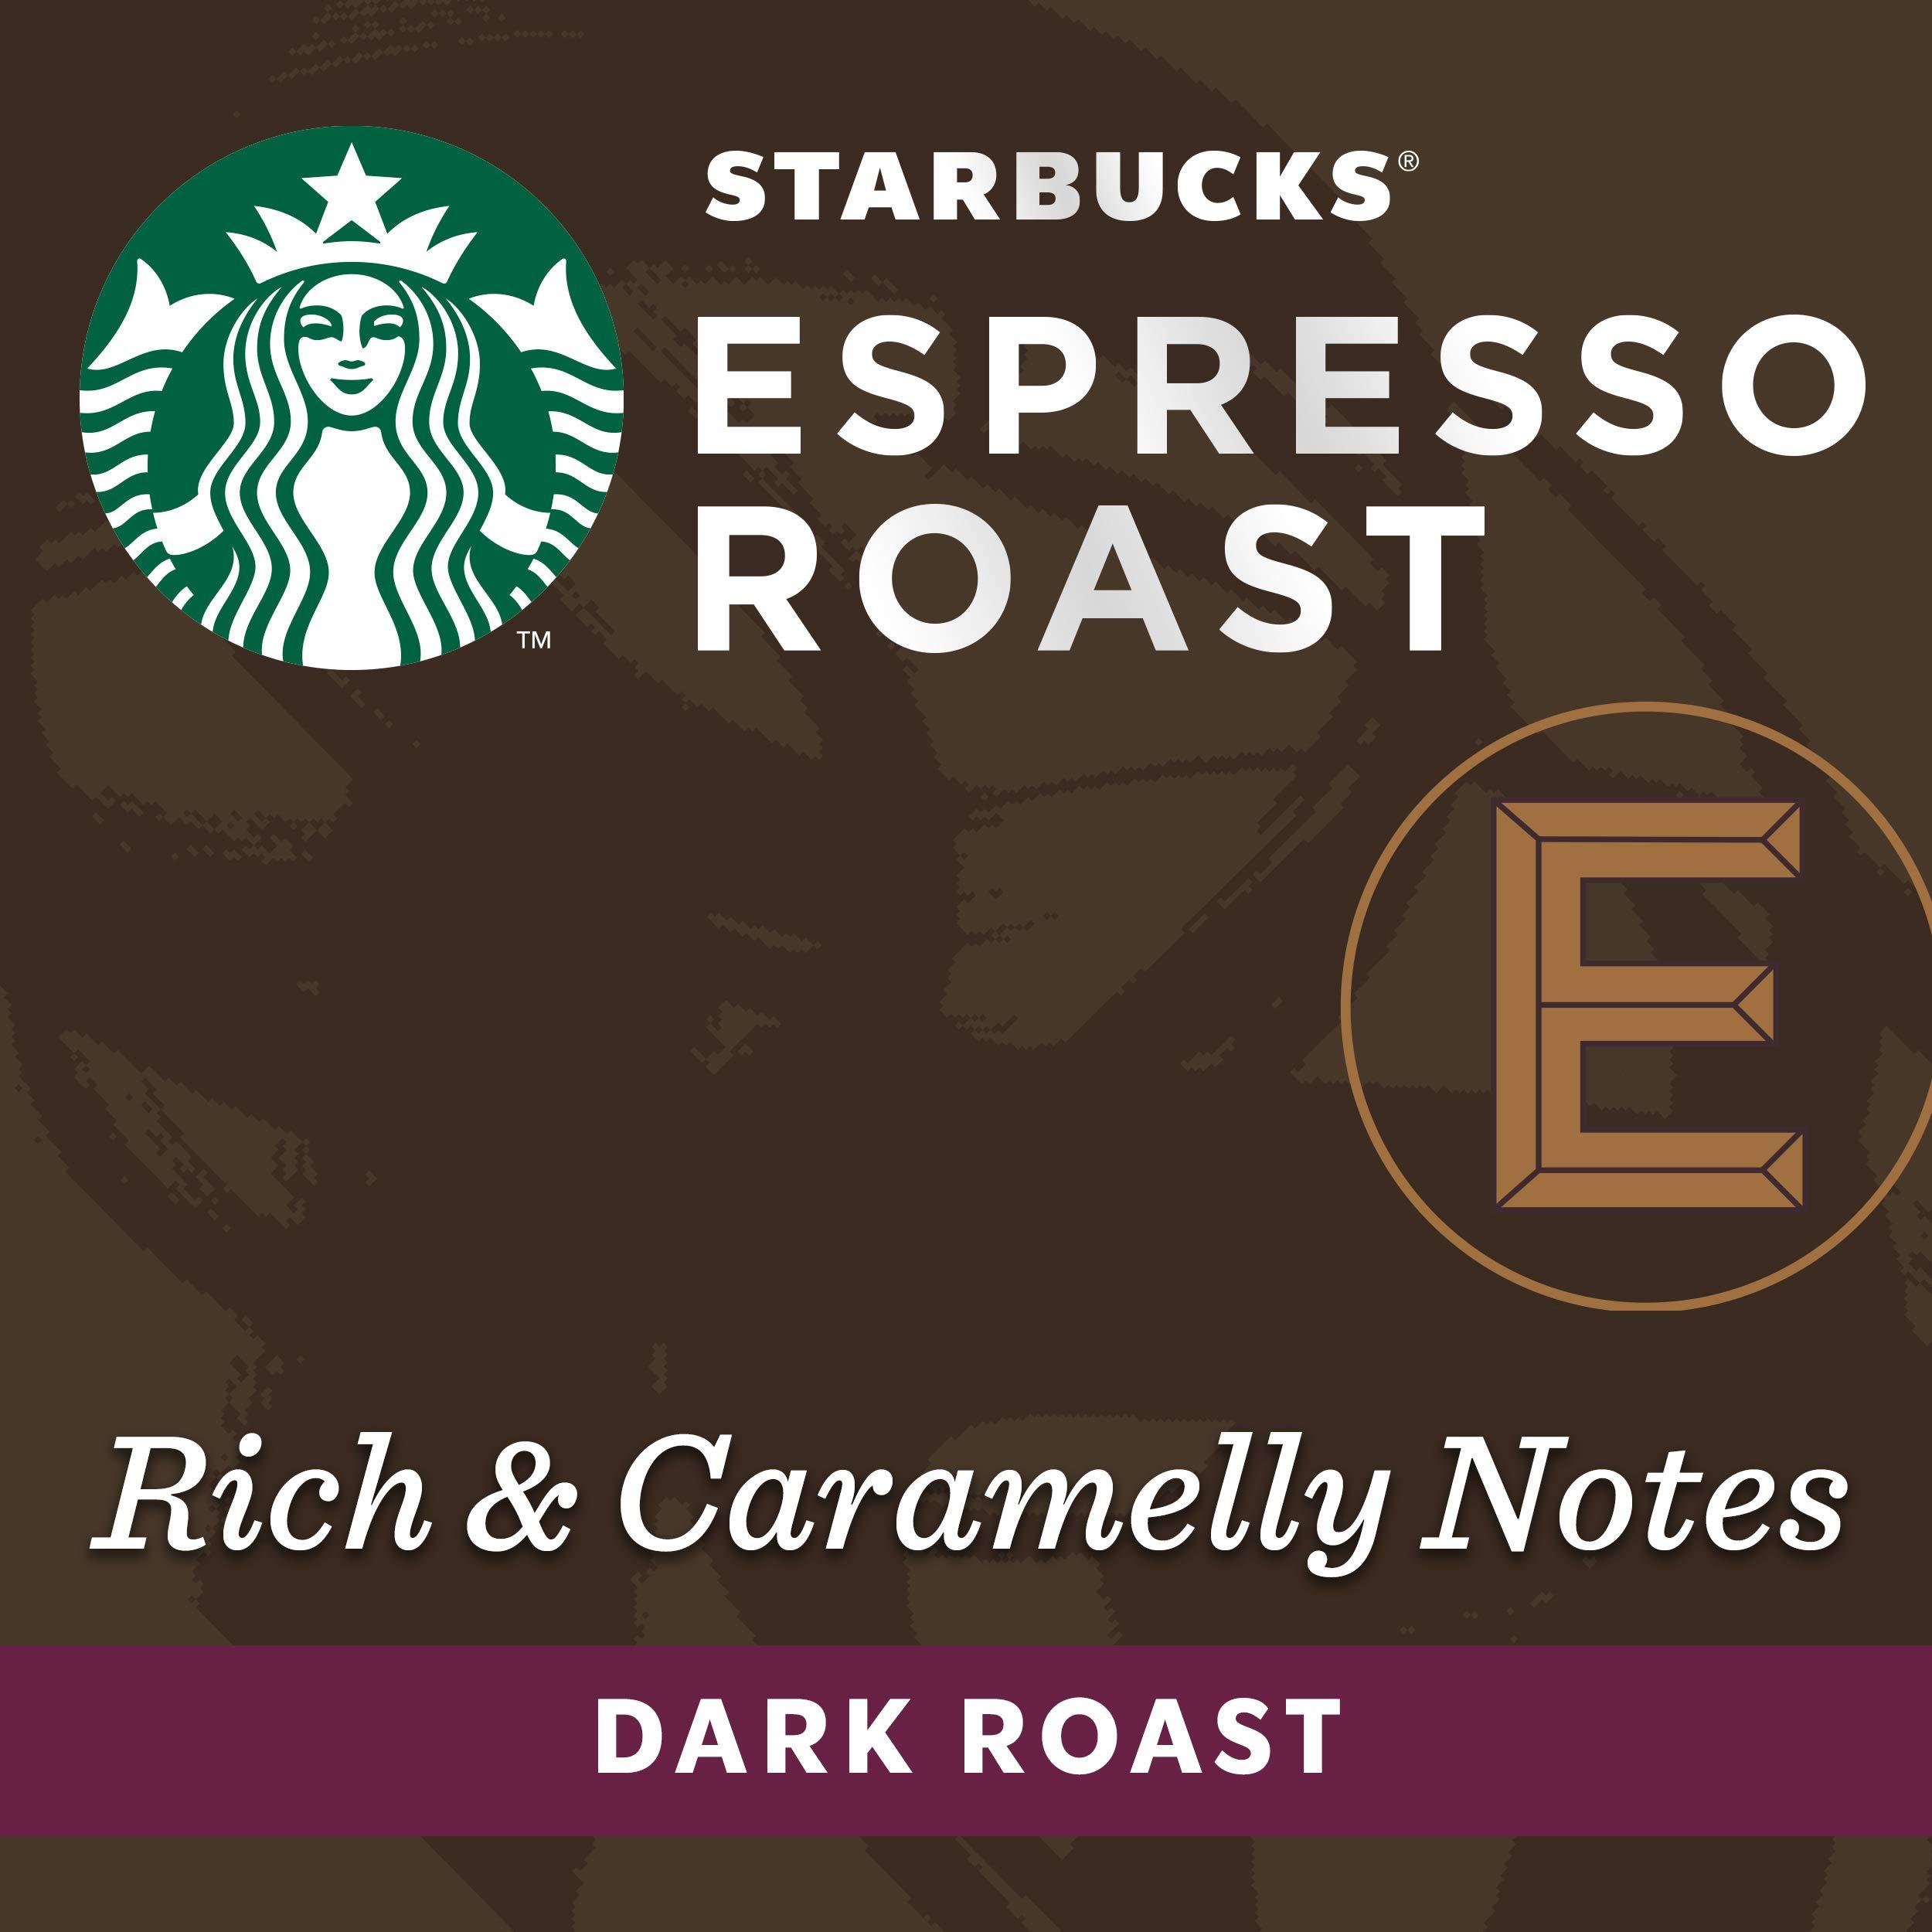 Starbucks by Nespresso, Espresso Dark Roast (50-count single serve capsules, compatible with Nespresso Original Line System) by Starbucks for Nespresso (Image #3)